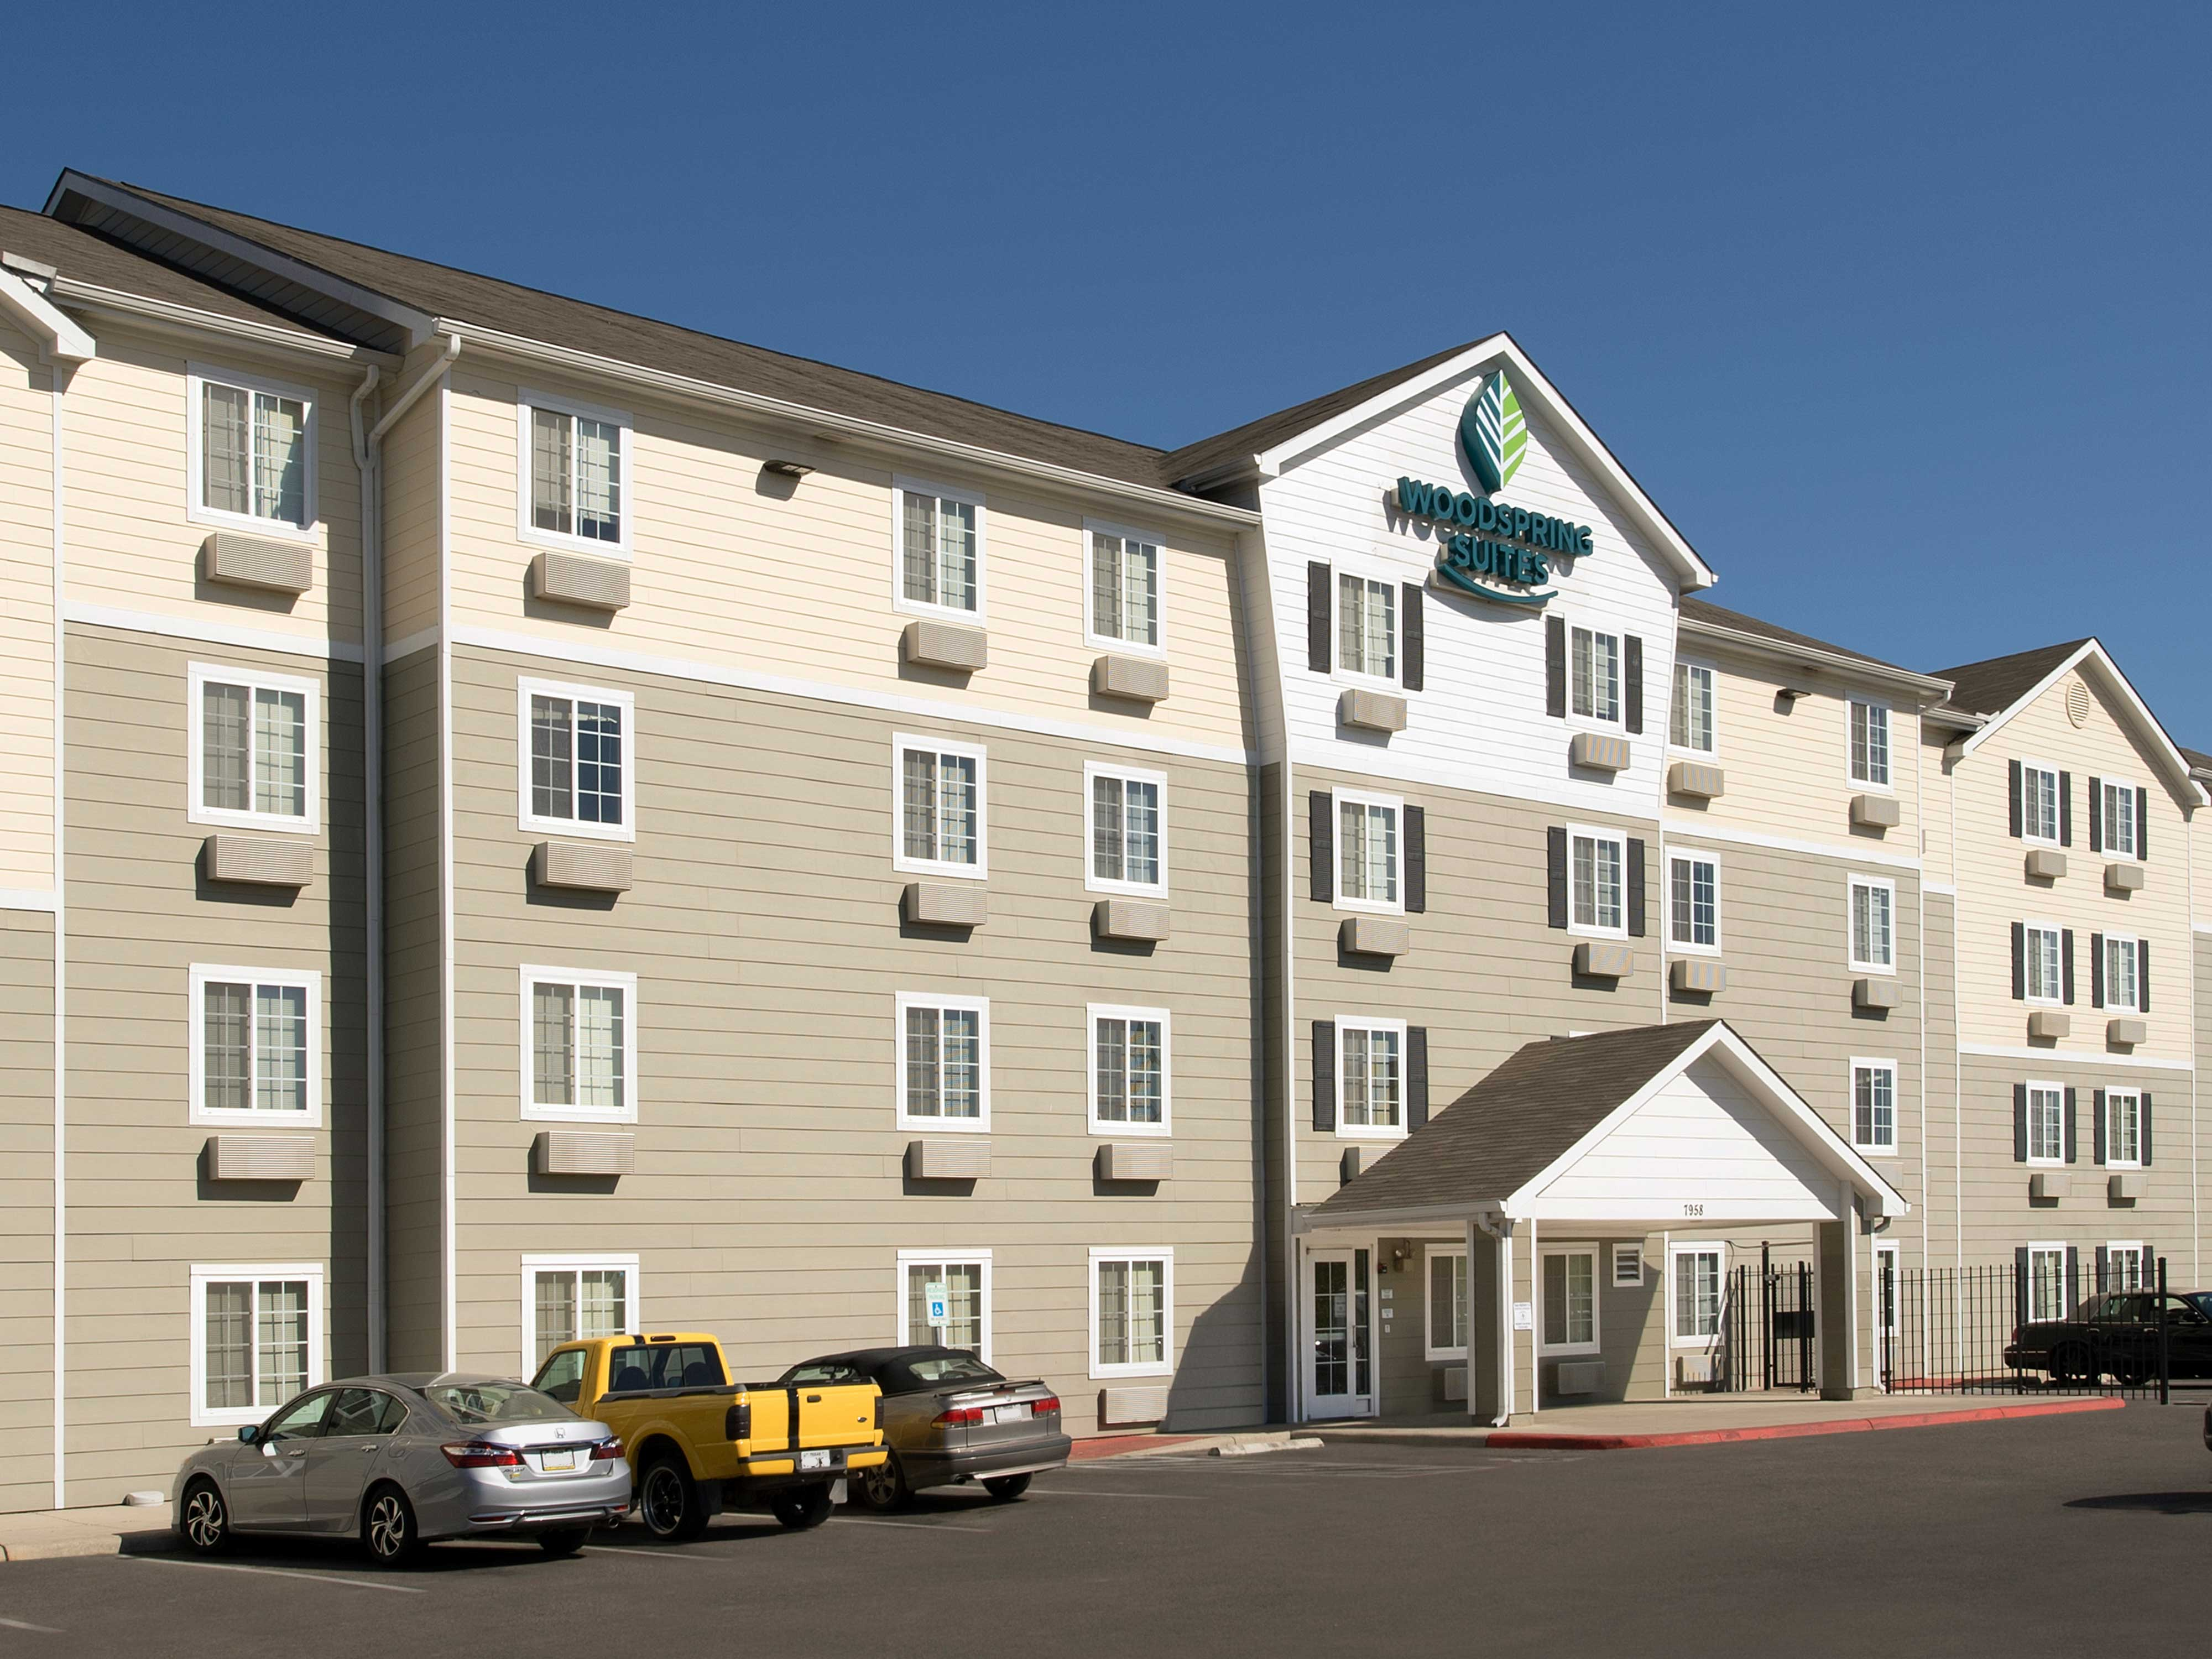 WoodSpring Suites San Antonio South image 16